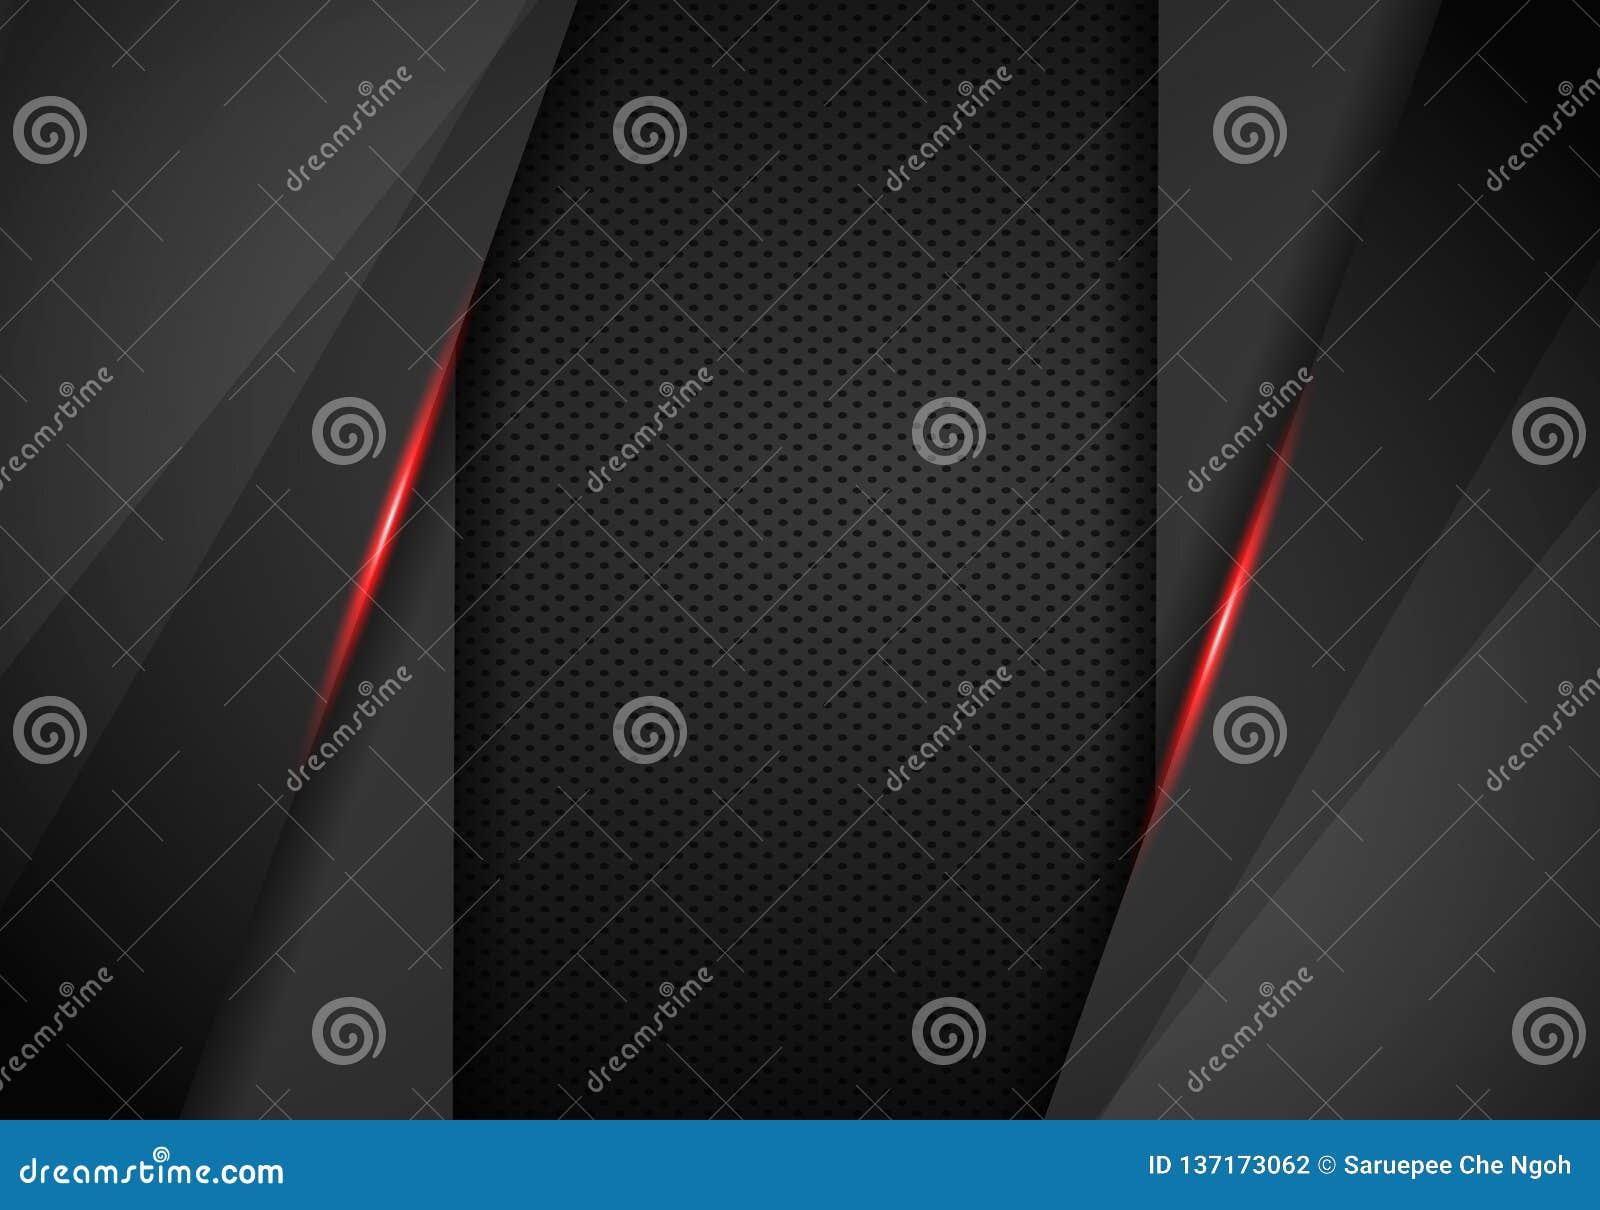 Black background overlap dimension grey vector illustration message board for text and message design modern website - Vector